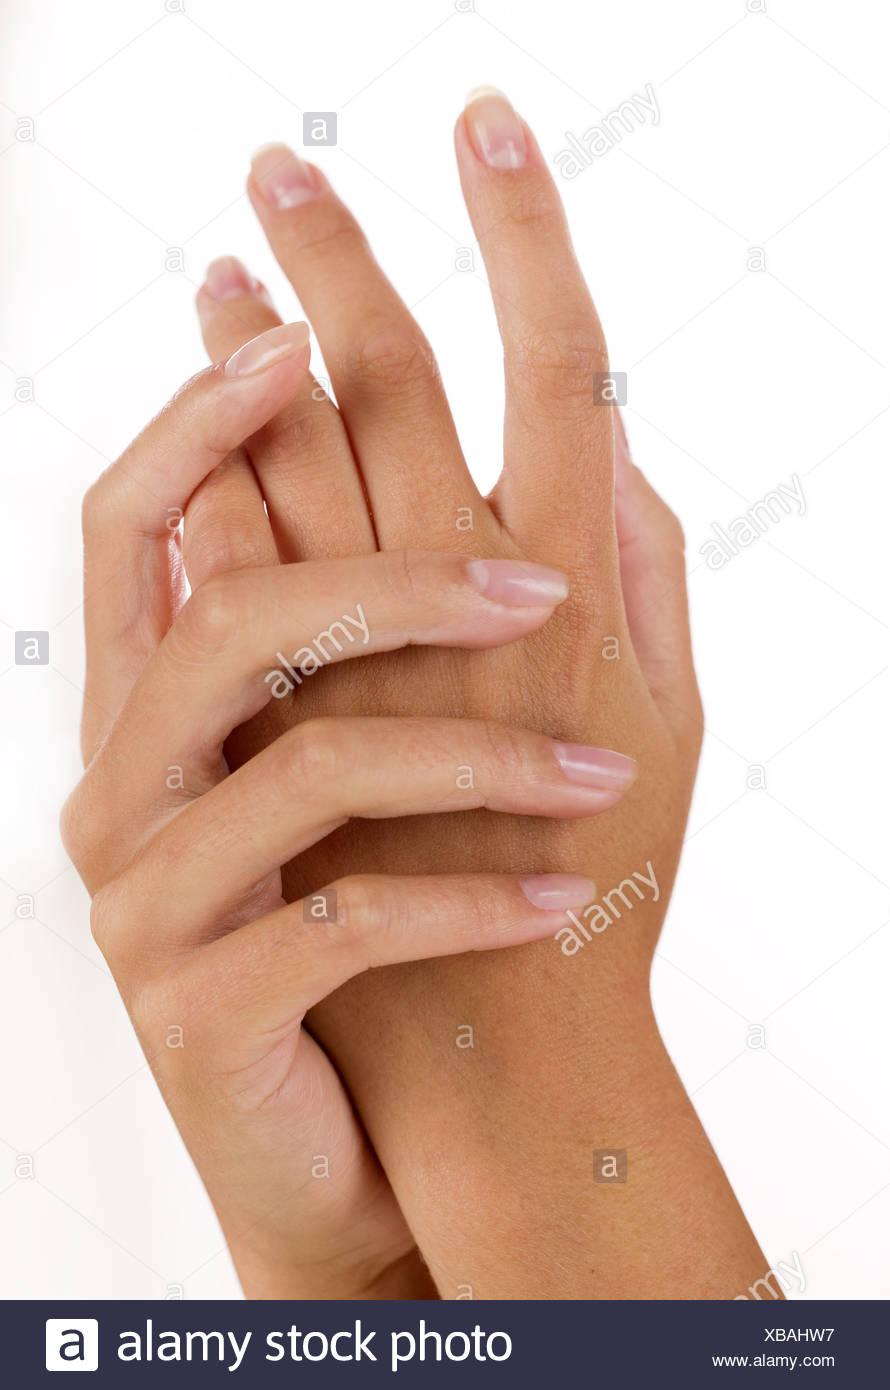 Closeup of female hands - Stock Image